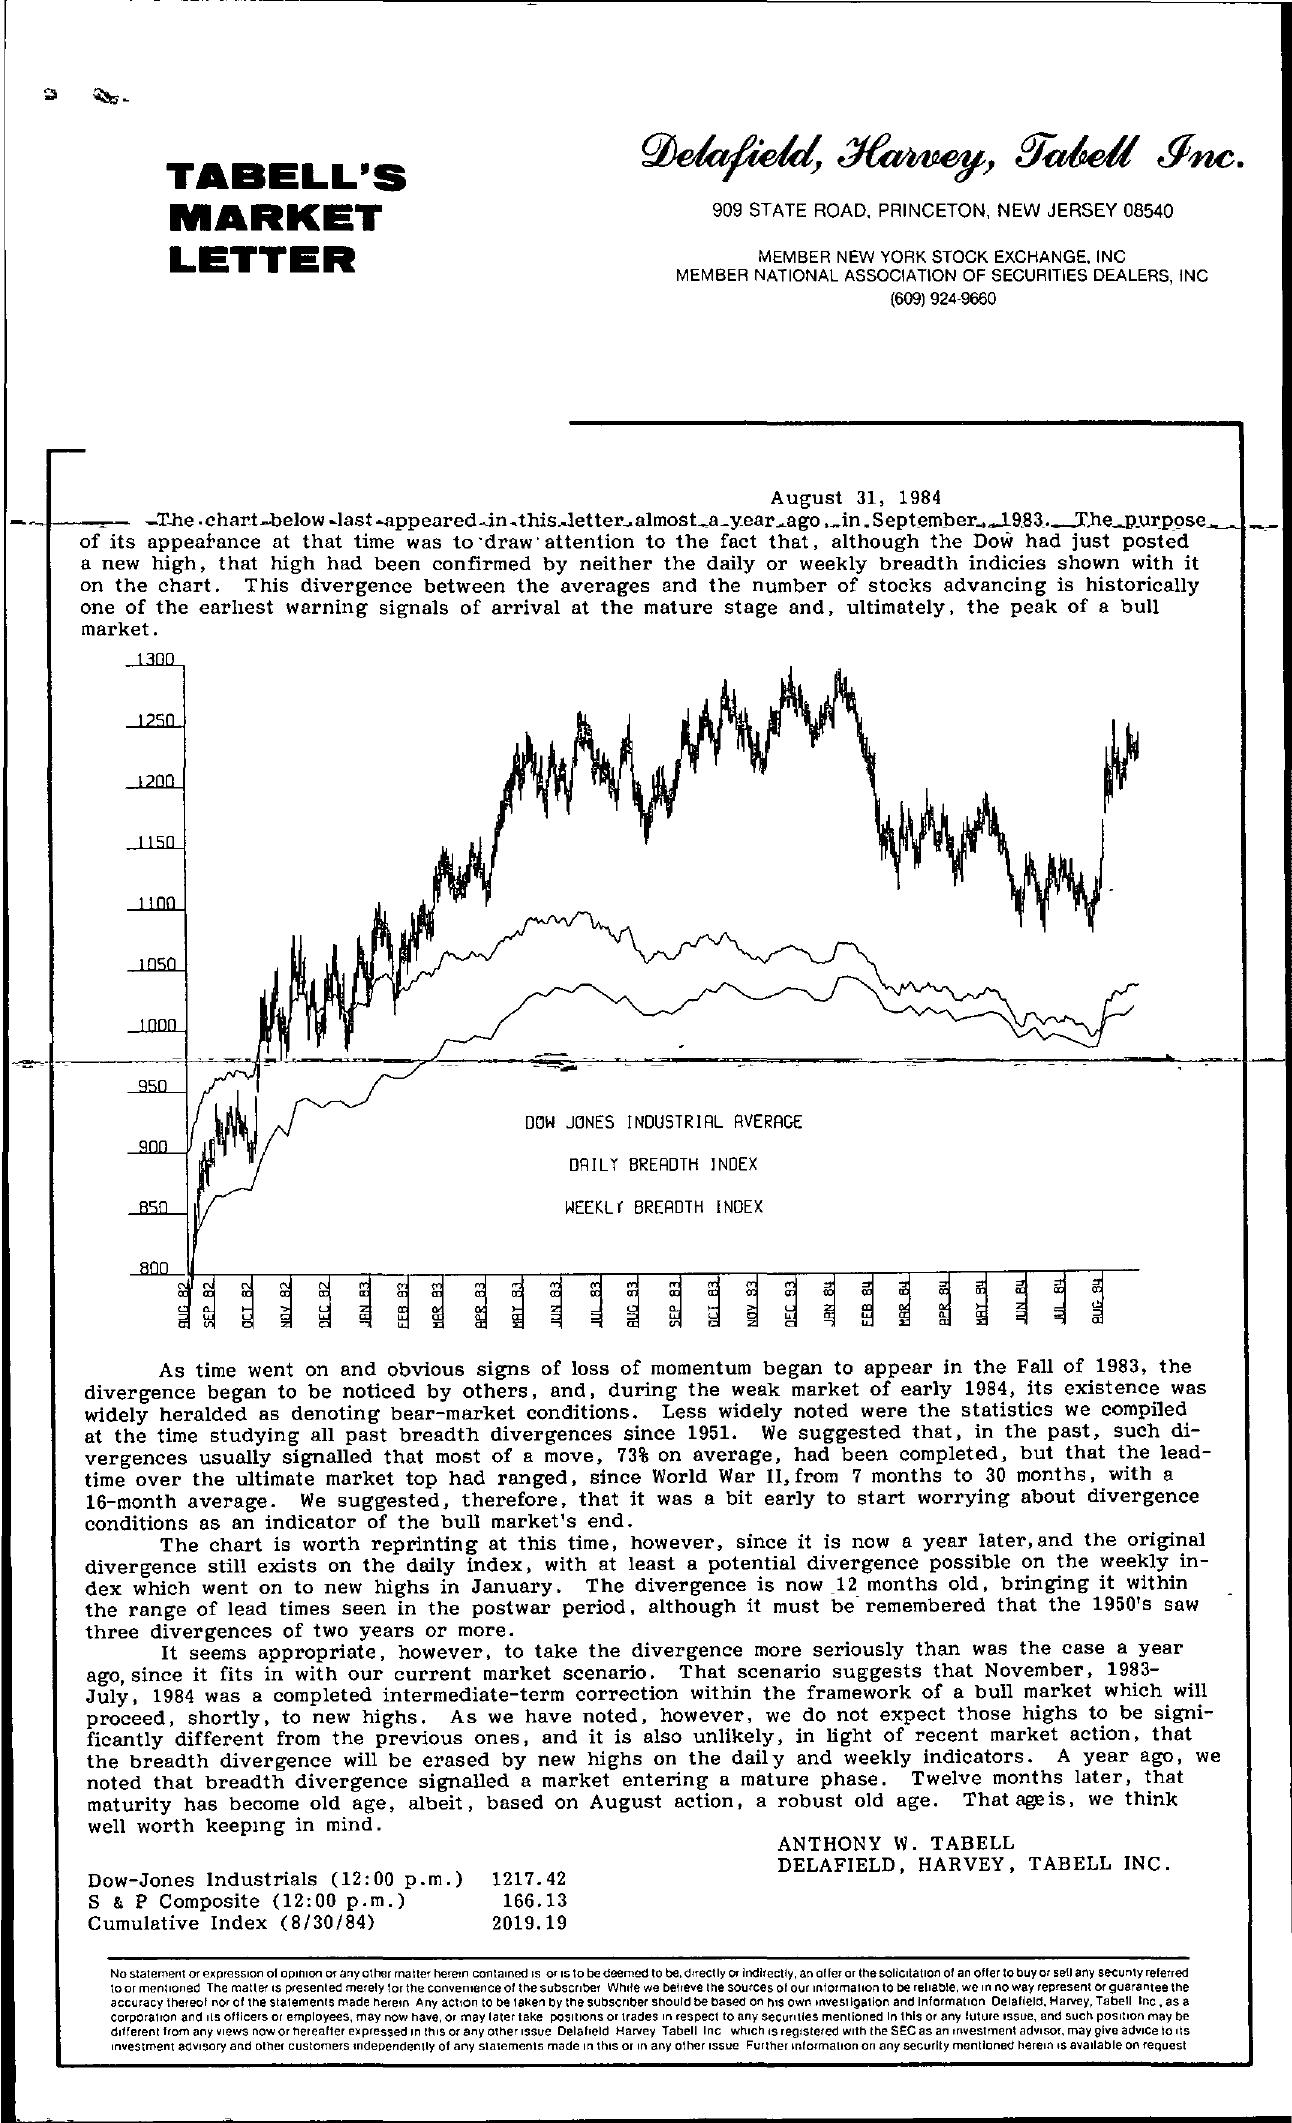 Tabell's Market Letter - August 31, 1984